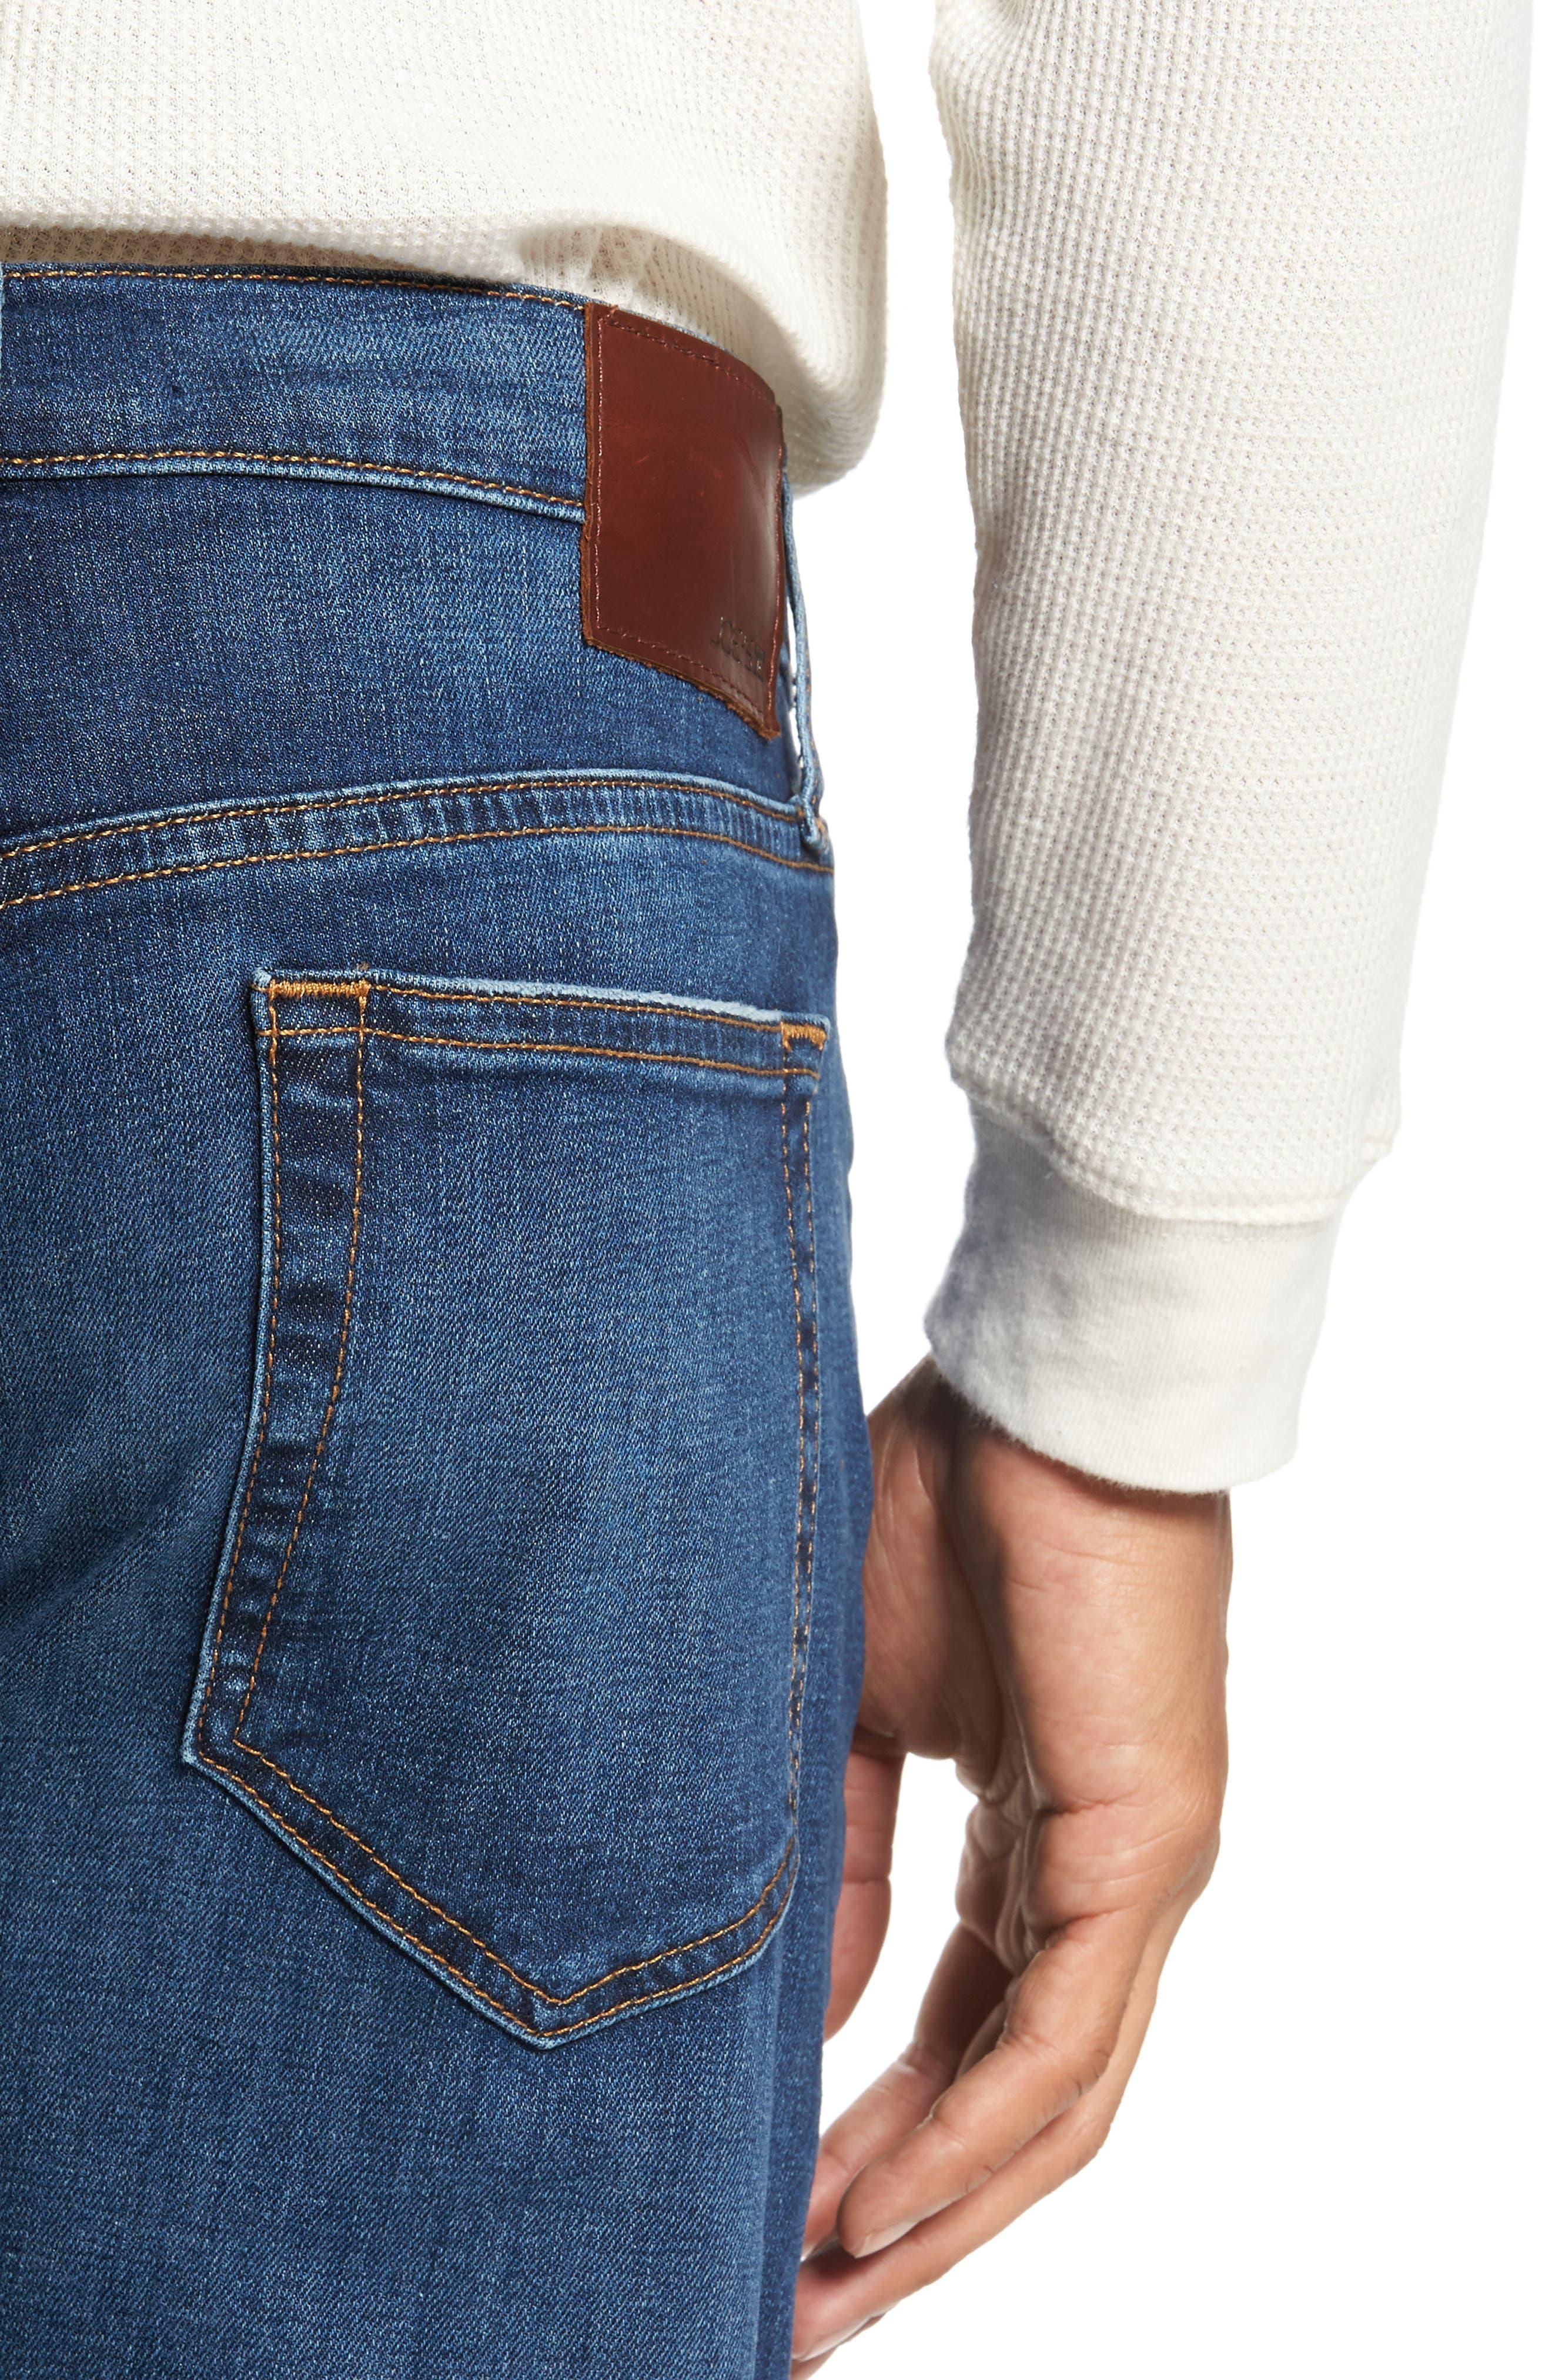 Brixton Slim Straight Leg Jeans,                             Alternate thumbnail 4, color,                             Bradlee